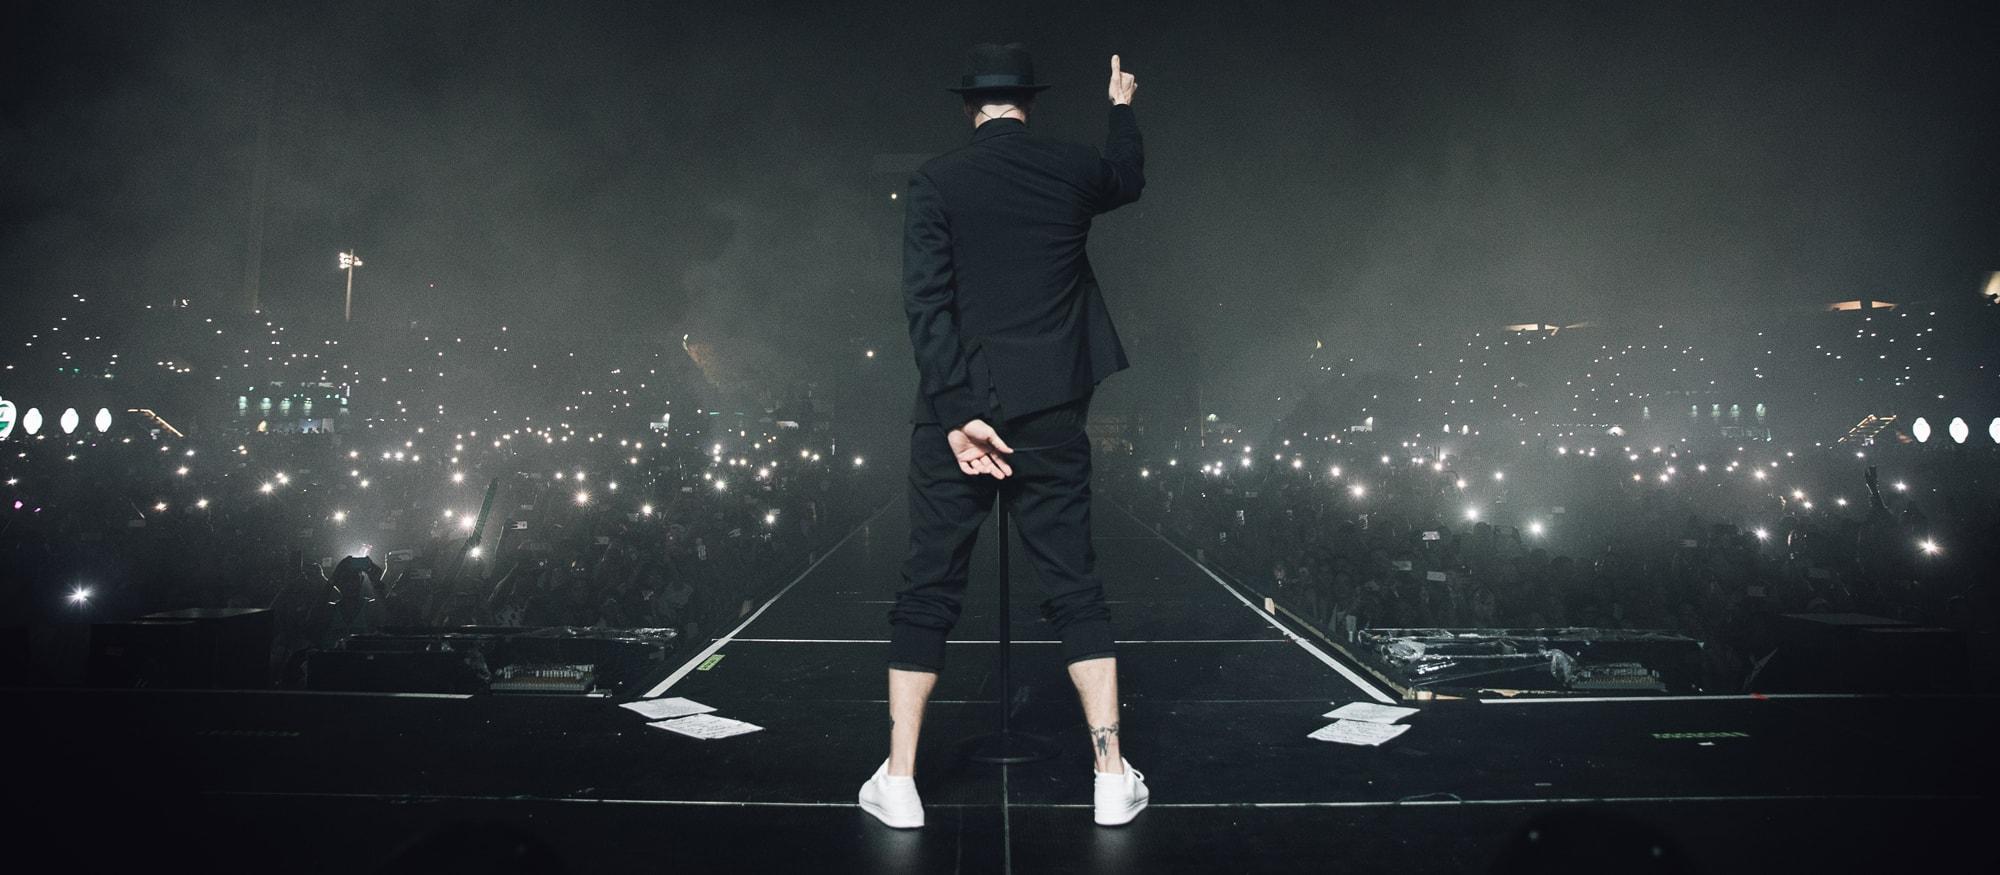 Mark Nguyen marklashark Justin Timberlake Man of the Woods Tour Air Jordan 3 JTH Diddy Bad Boy Melrose Los Angeles Barbershop Maybe Tomorrow Photographer Photography Music Rap Hip Hop Super Bowl LII Stage